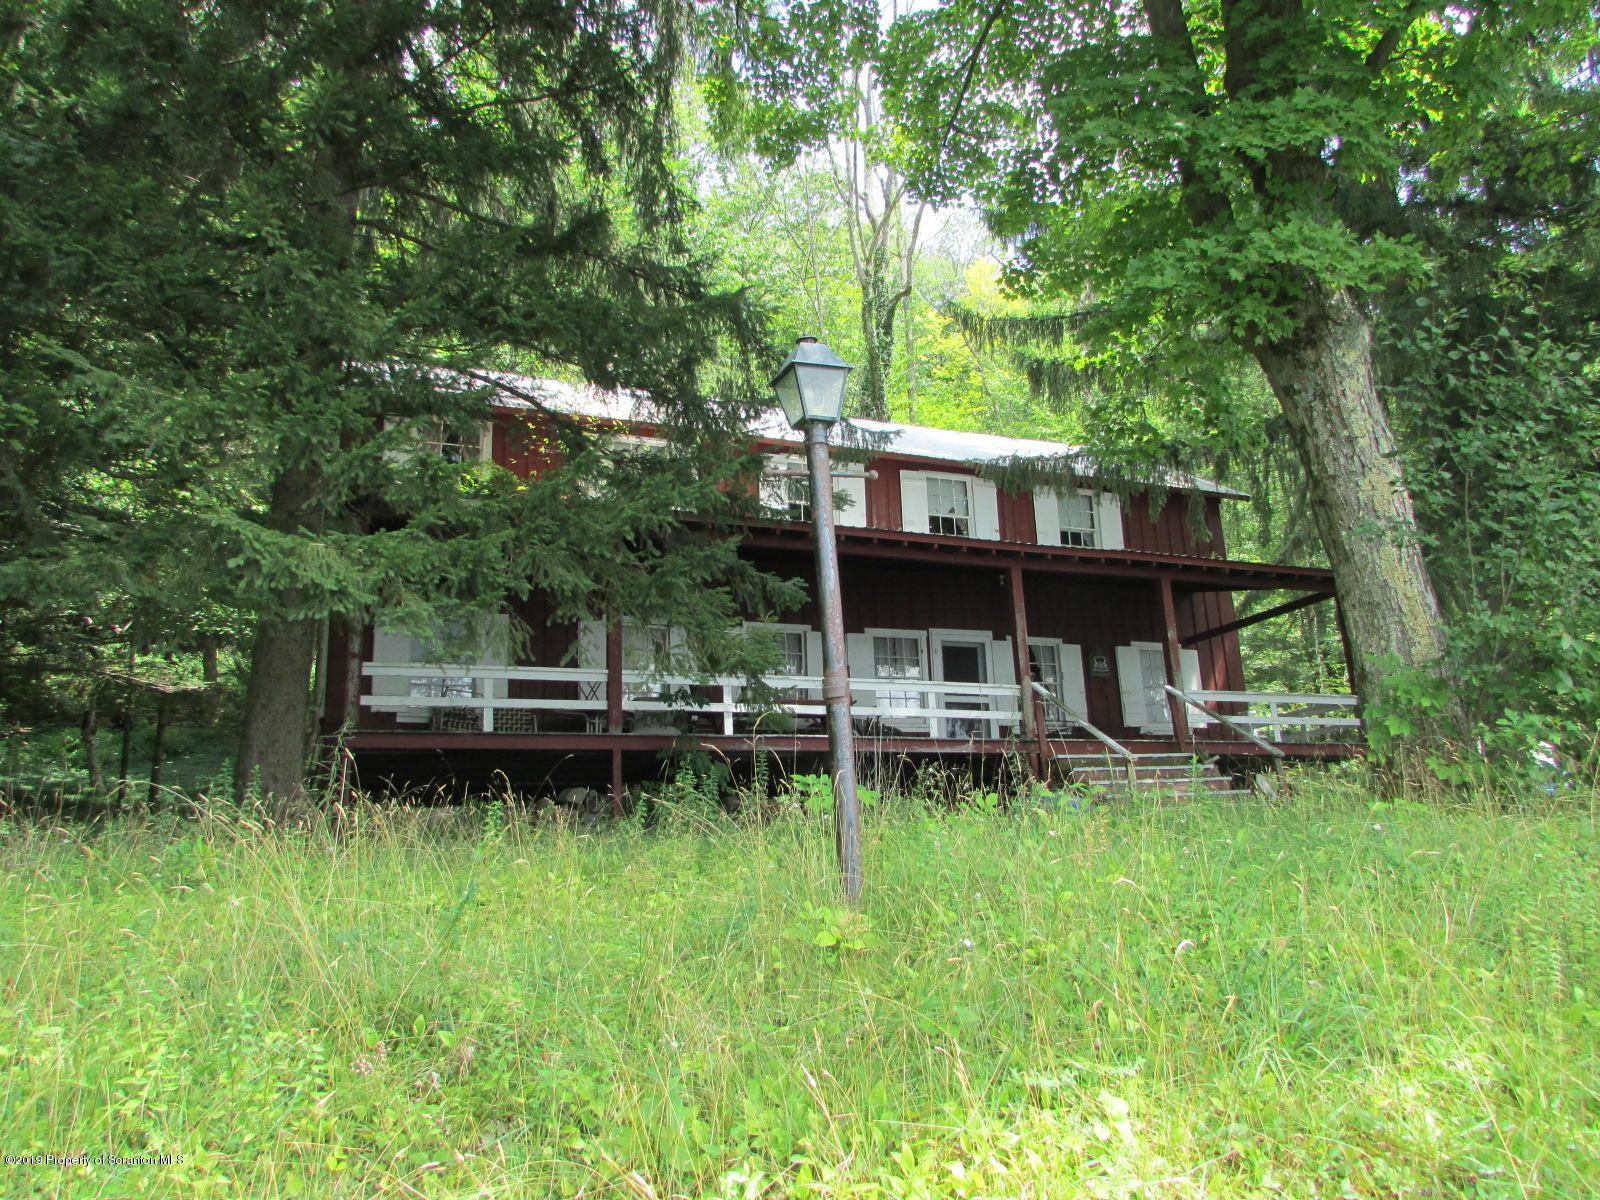 8 Knappian Way, Montrose, Pennsylvania 18801, 6 Bedrooms Bedrooms, 10 Rooms Rooms,2 BathroomsBathrooms,Single Family,For Sale,Knappian Way,19-3852